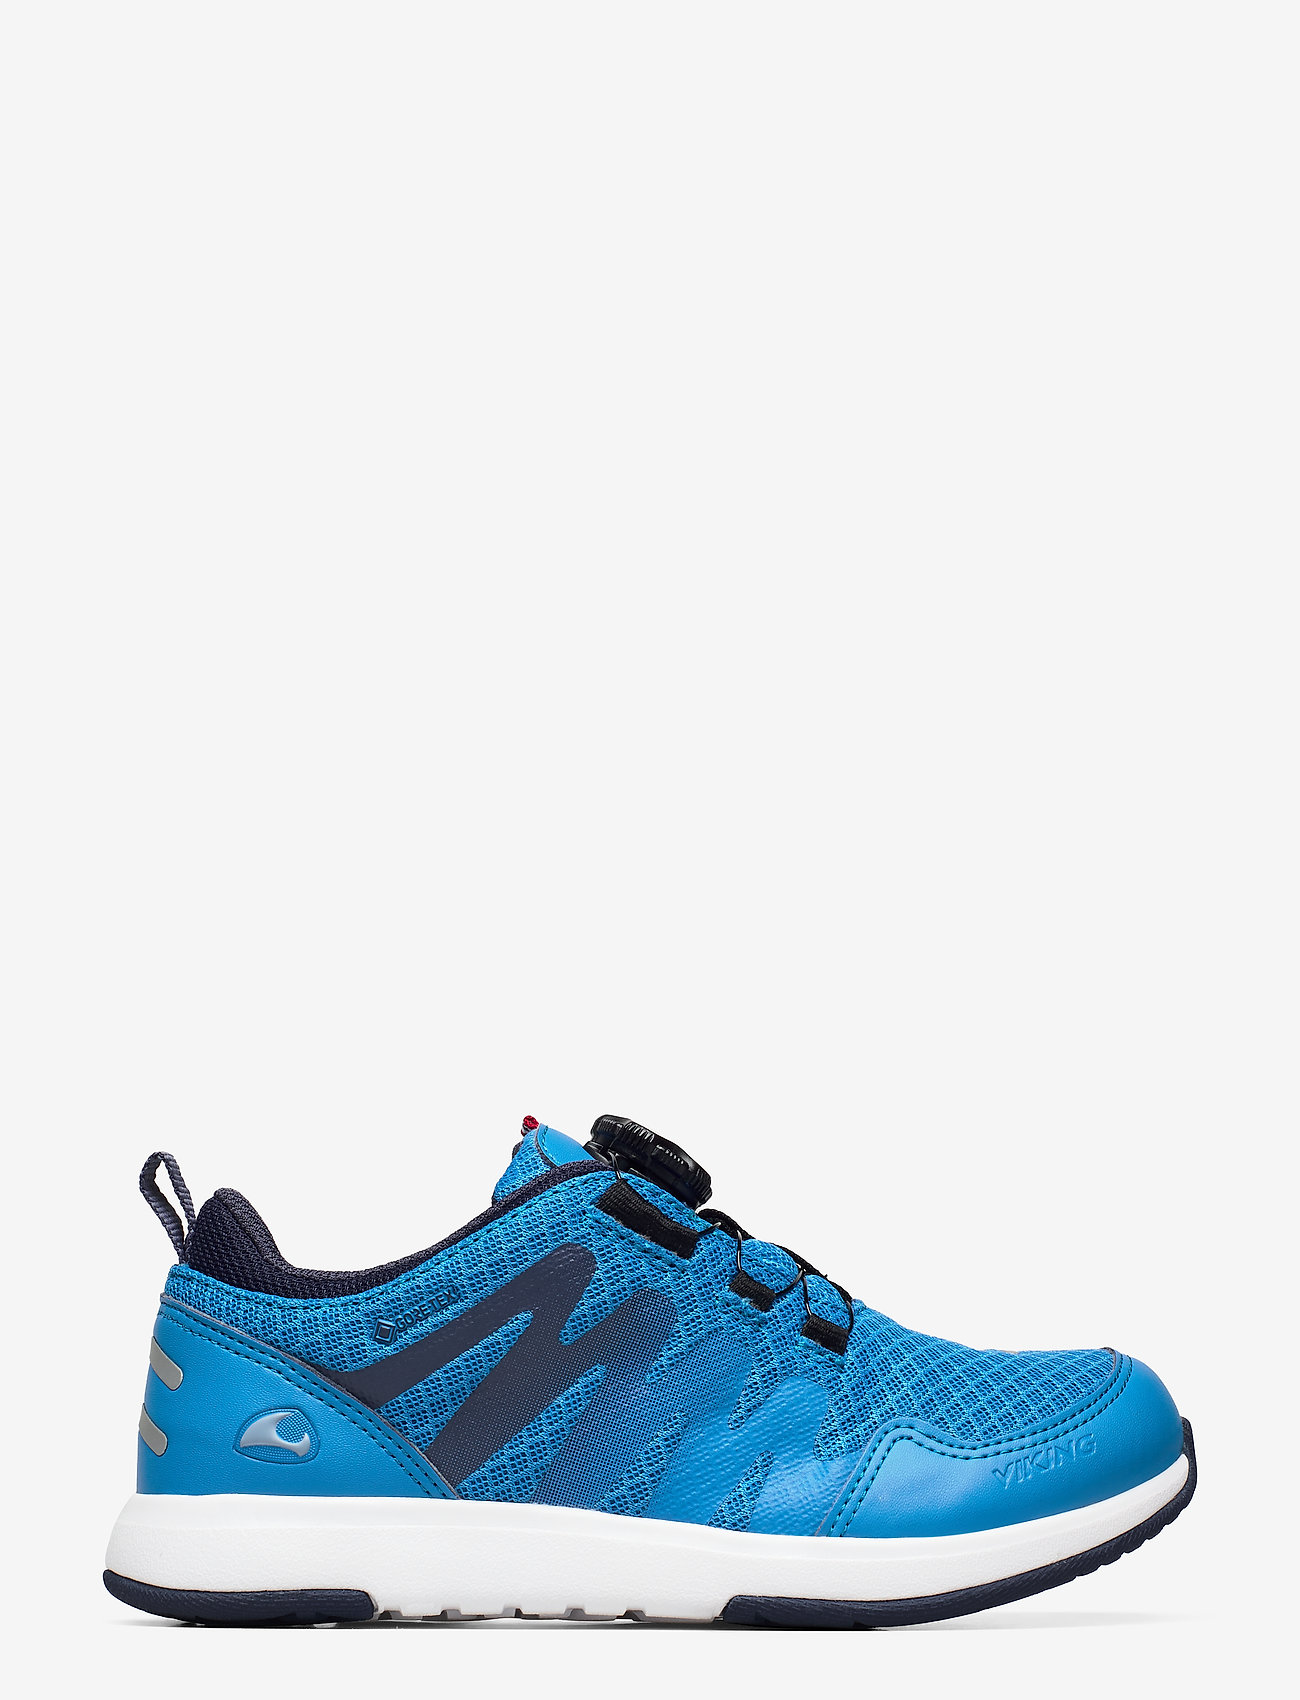 Viking - Bislett 2.0 Boa GTX - sport shoes - blue/navy - 1